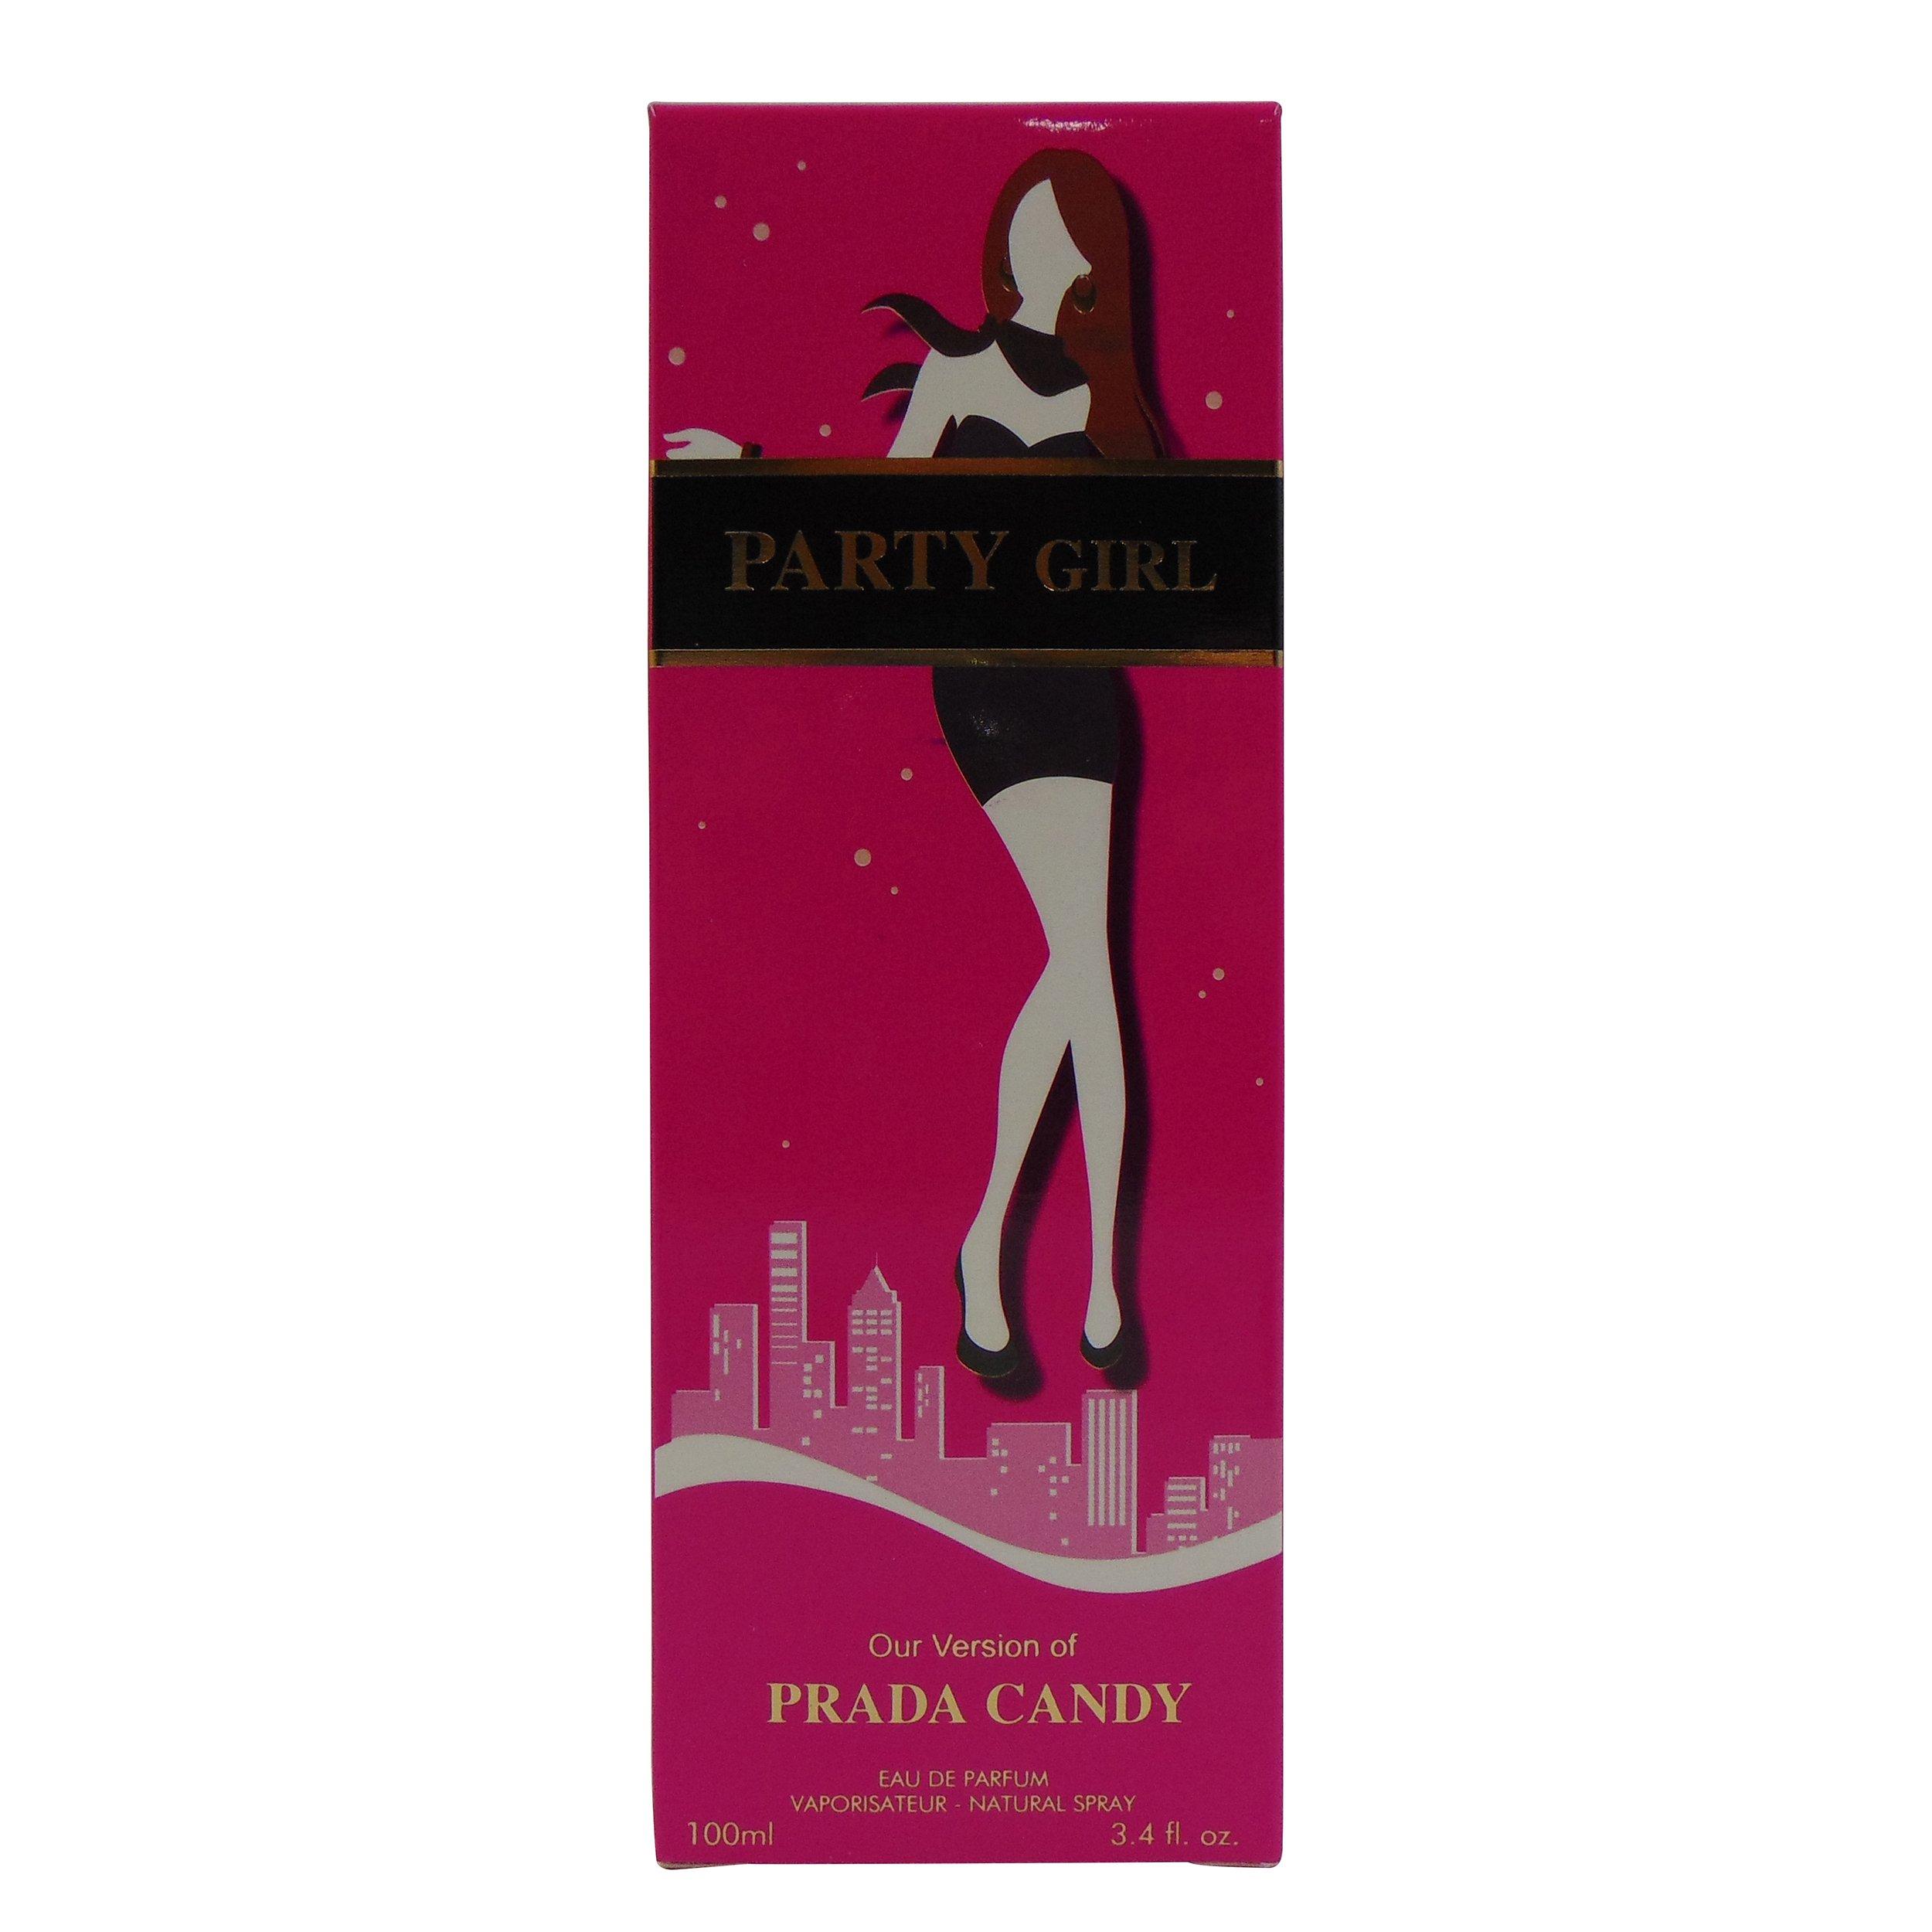 DISCO GIRL, Our Version of CANDY BY PRADA,3.4 fl.oz. Eau de Parfum Spray for Women, Perfect Gift